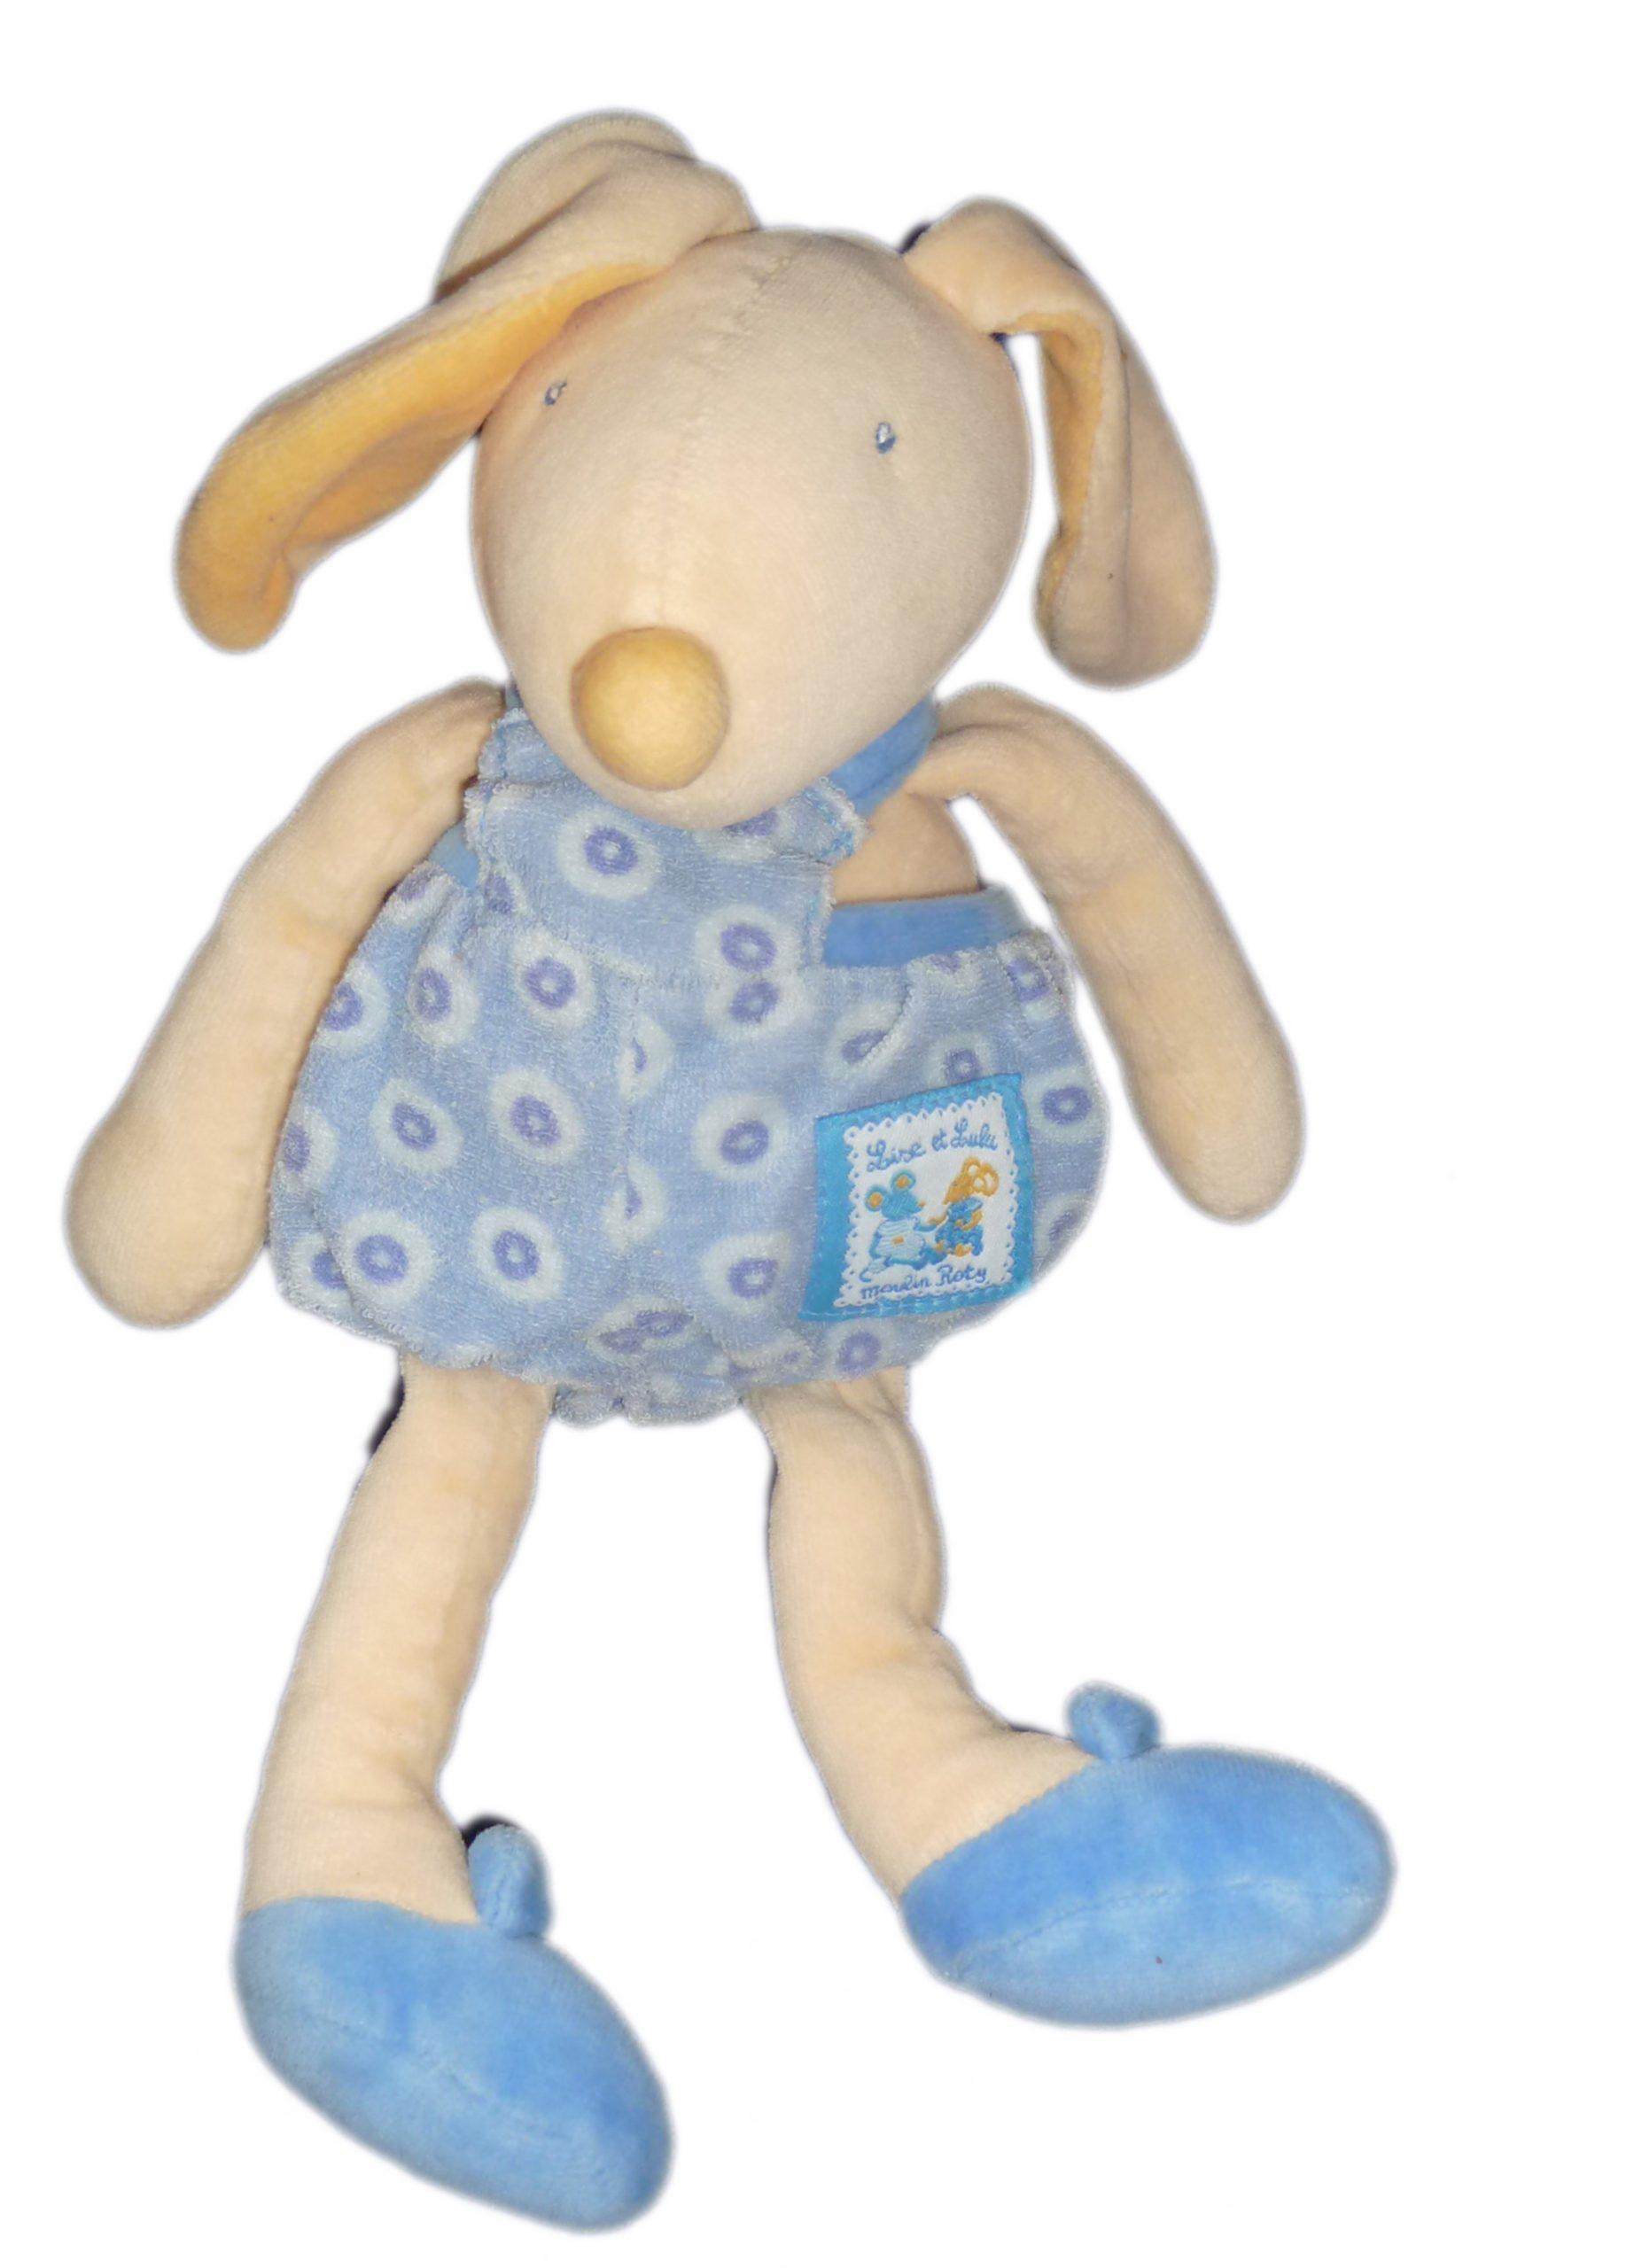 Doudou Lapin Bleu Jaune - Moulin Roty - Lise Et Lulu - H 26 Cm dedans Lapin Lulu